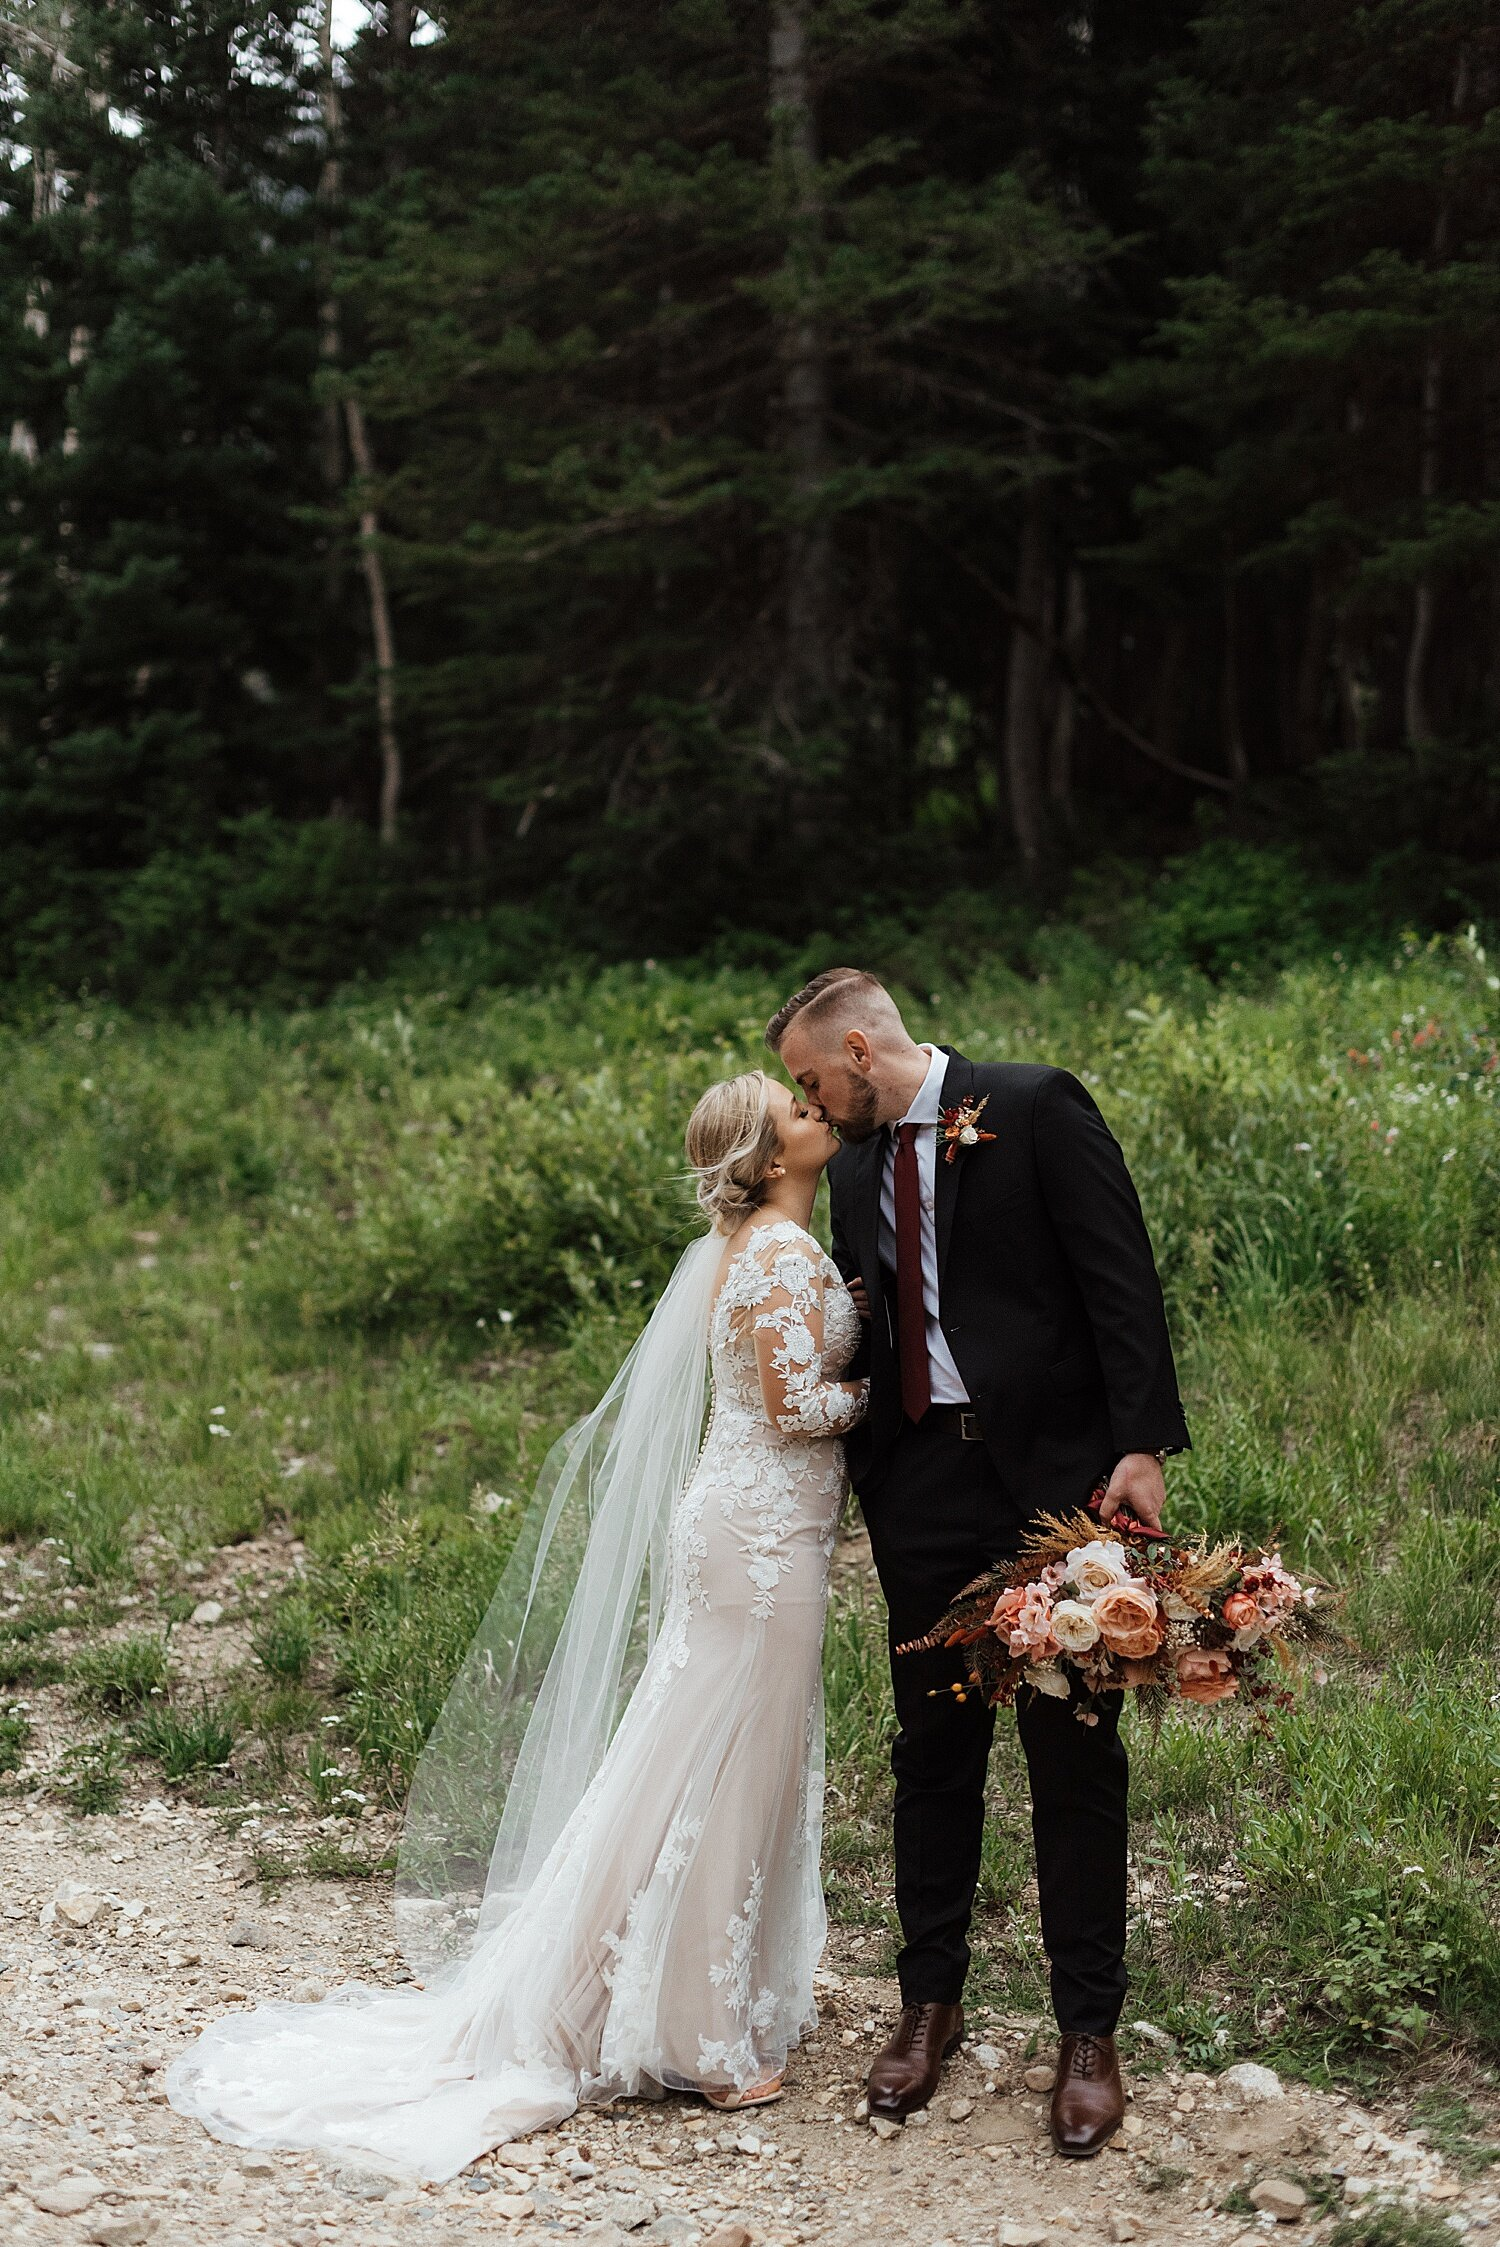 Zandra Barriga Photo - Hunter and Brighton Mountain Bridals_0015.jpg